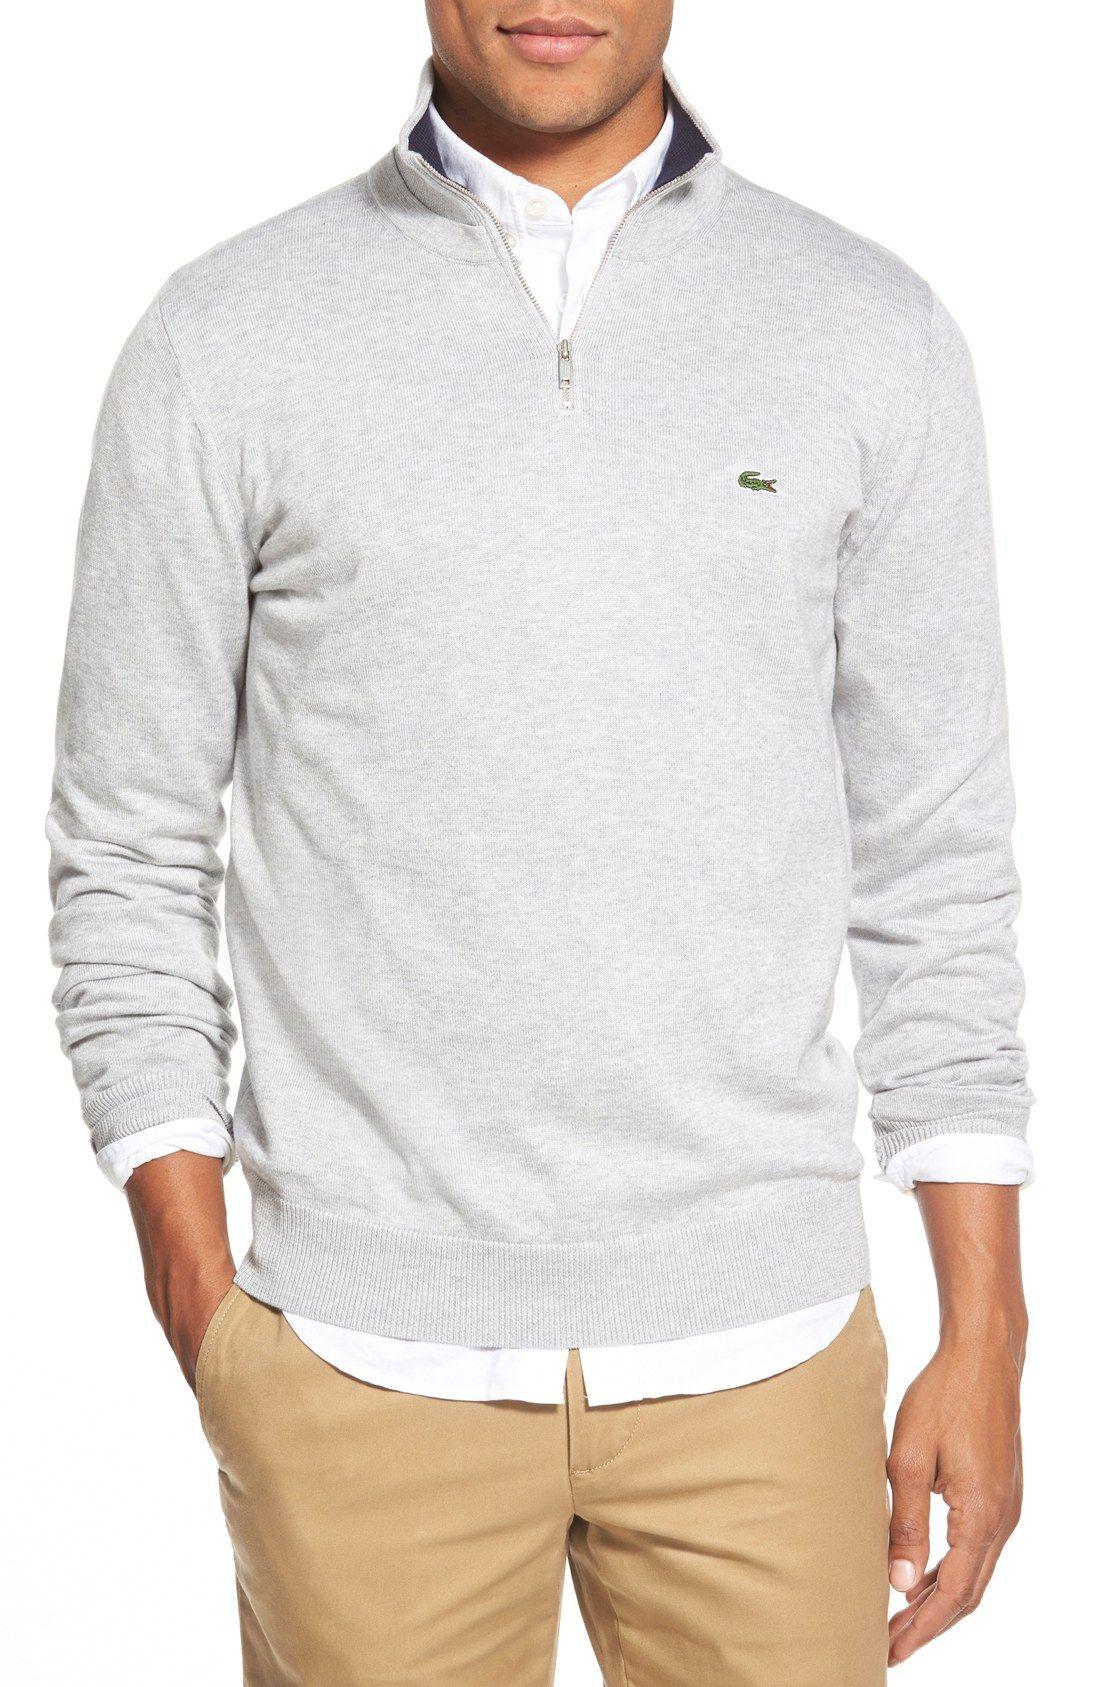 Lacoste Quarter Zip Pullover Sweater